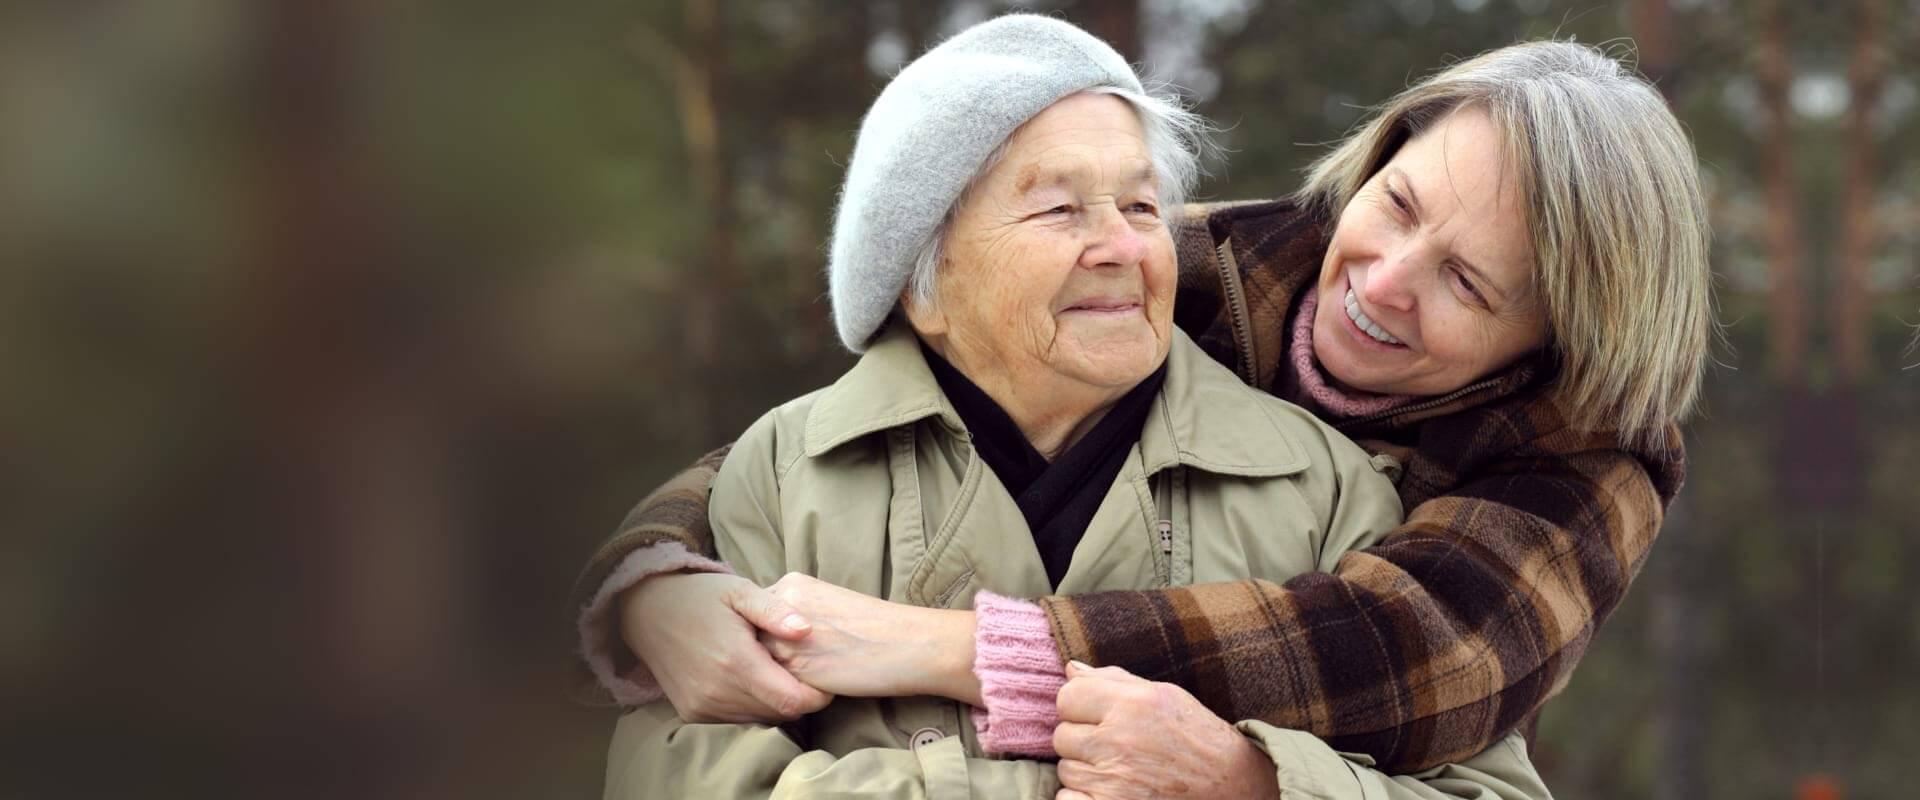 elder woman with her daughter